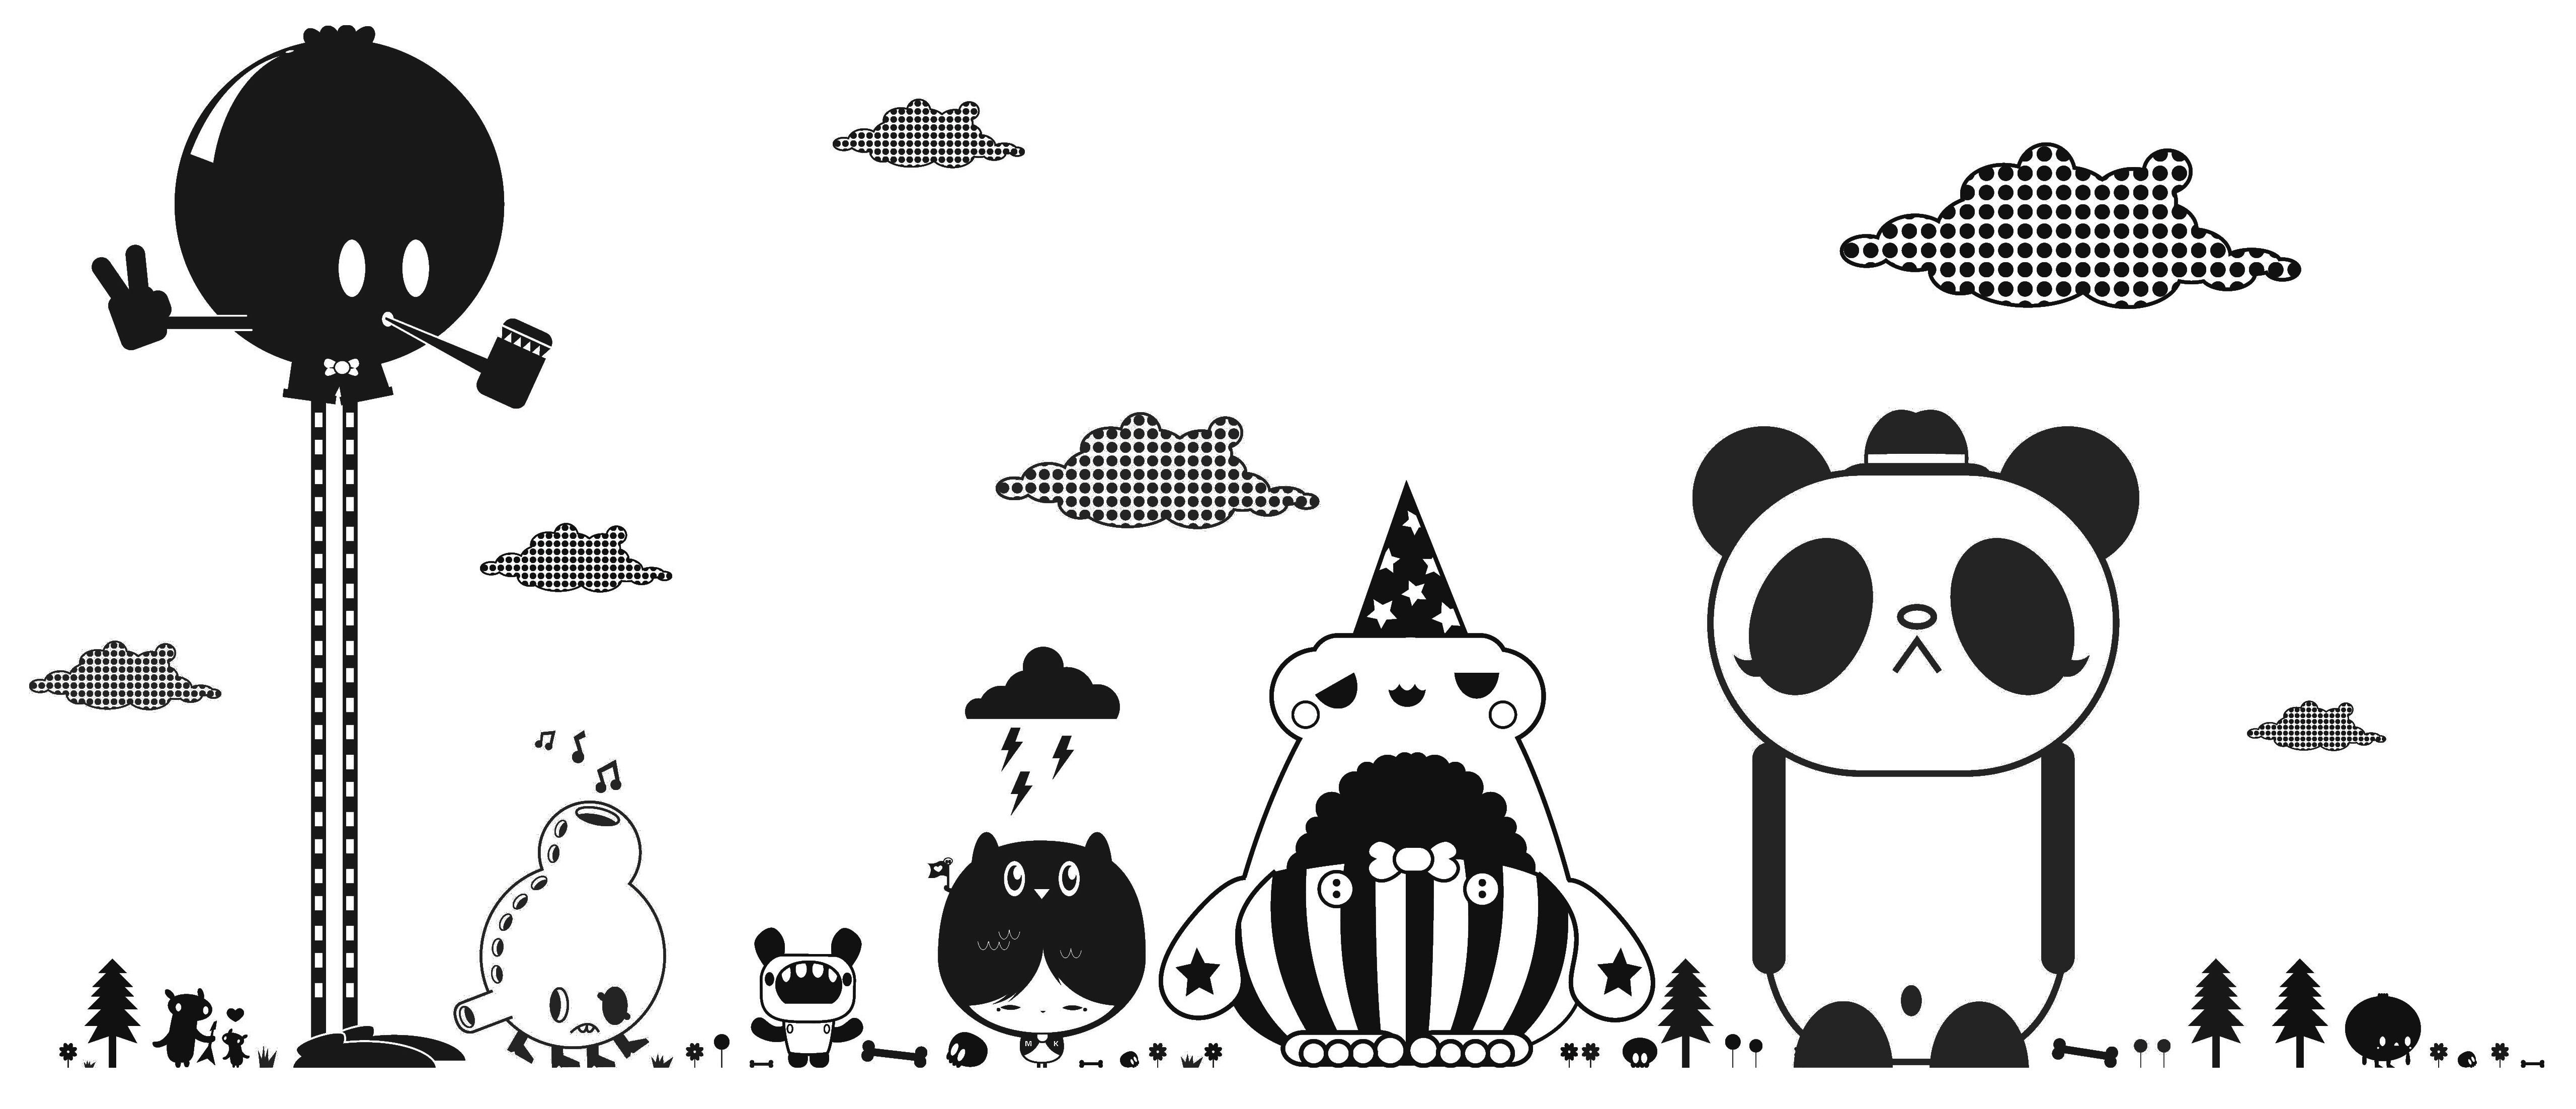 Decoration - Wallpaper & Wall Stickers - Friends 1 Black Sticker by Domestic - Black - Vinal